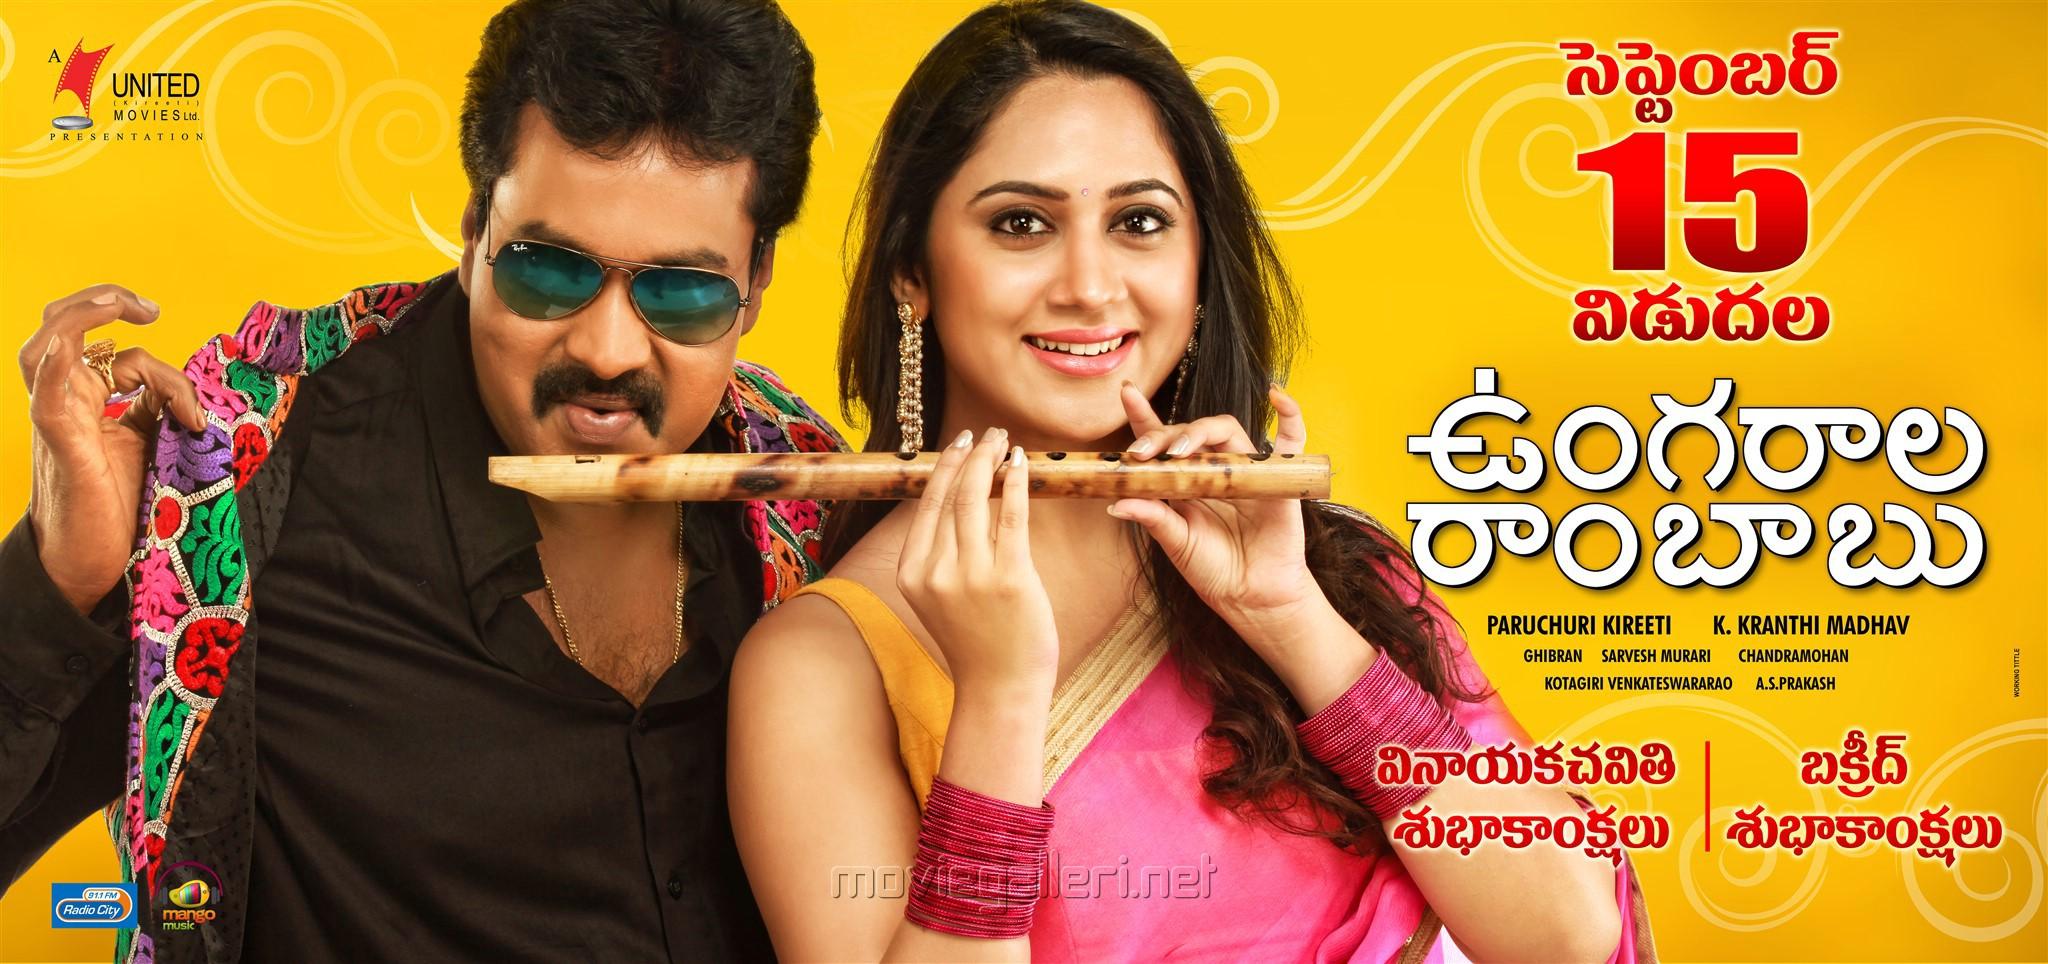 Sunil Miya George Ungarala Rambabu Movie Release Date September 15th Wallpapers